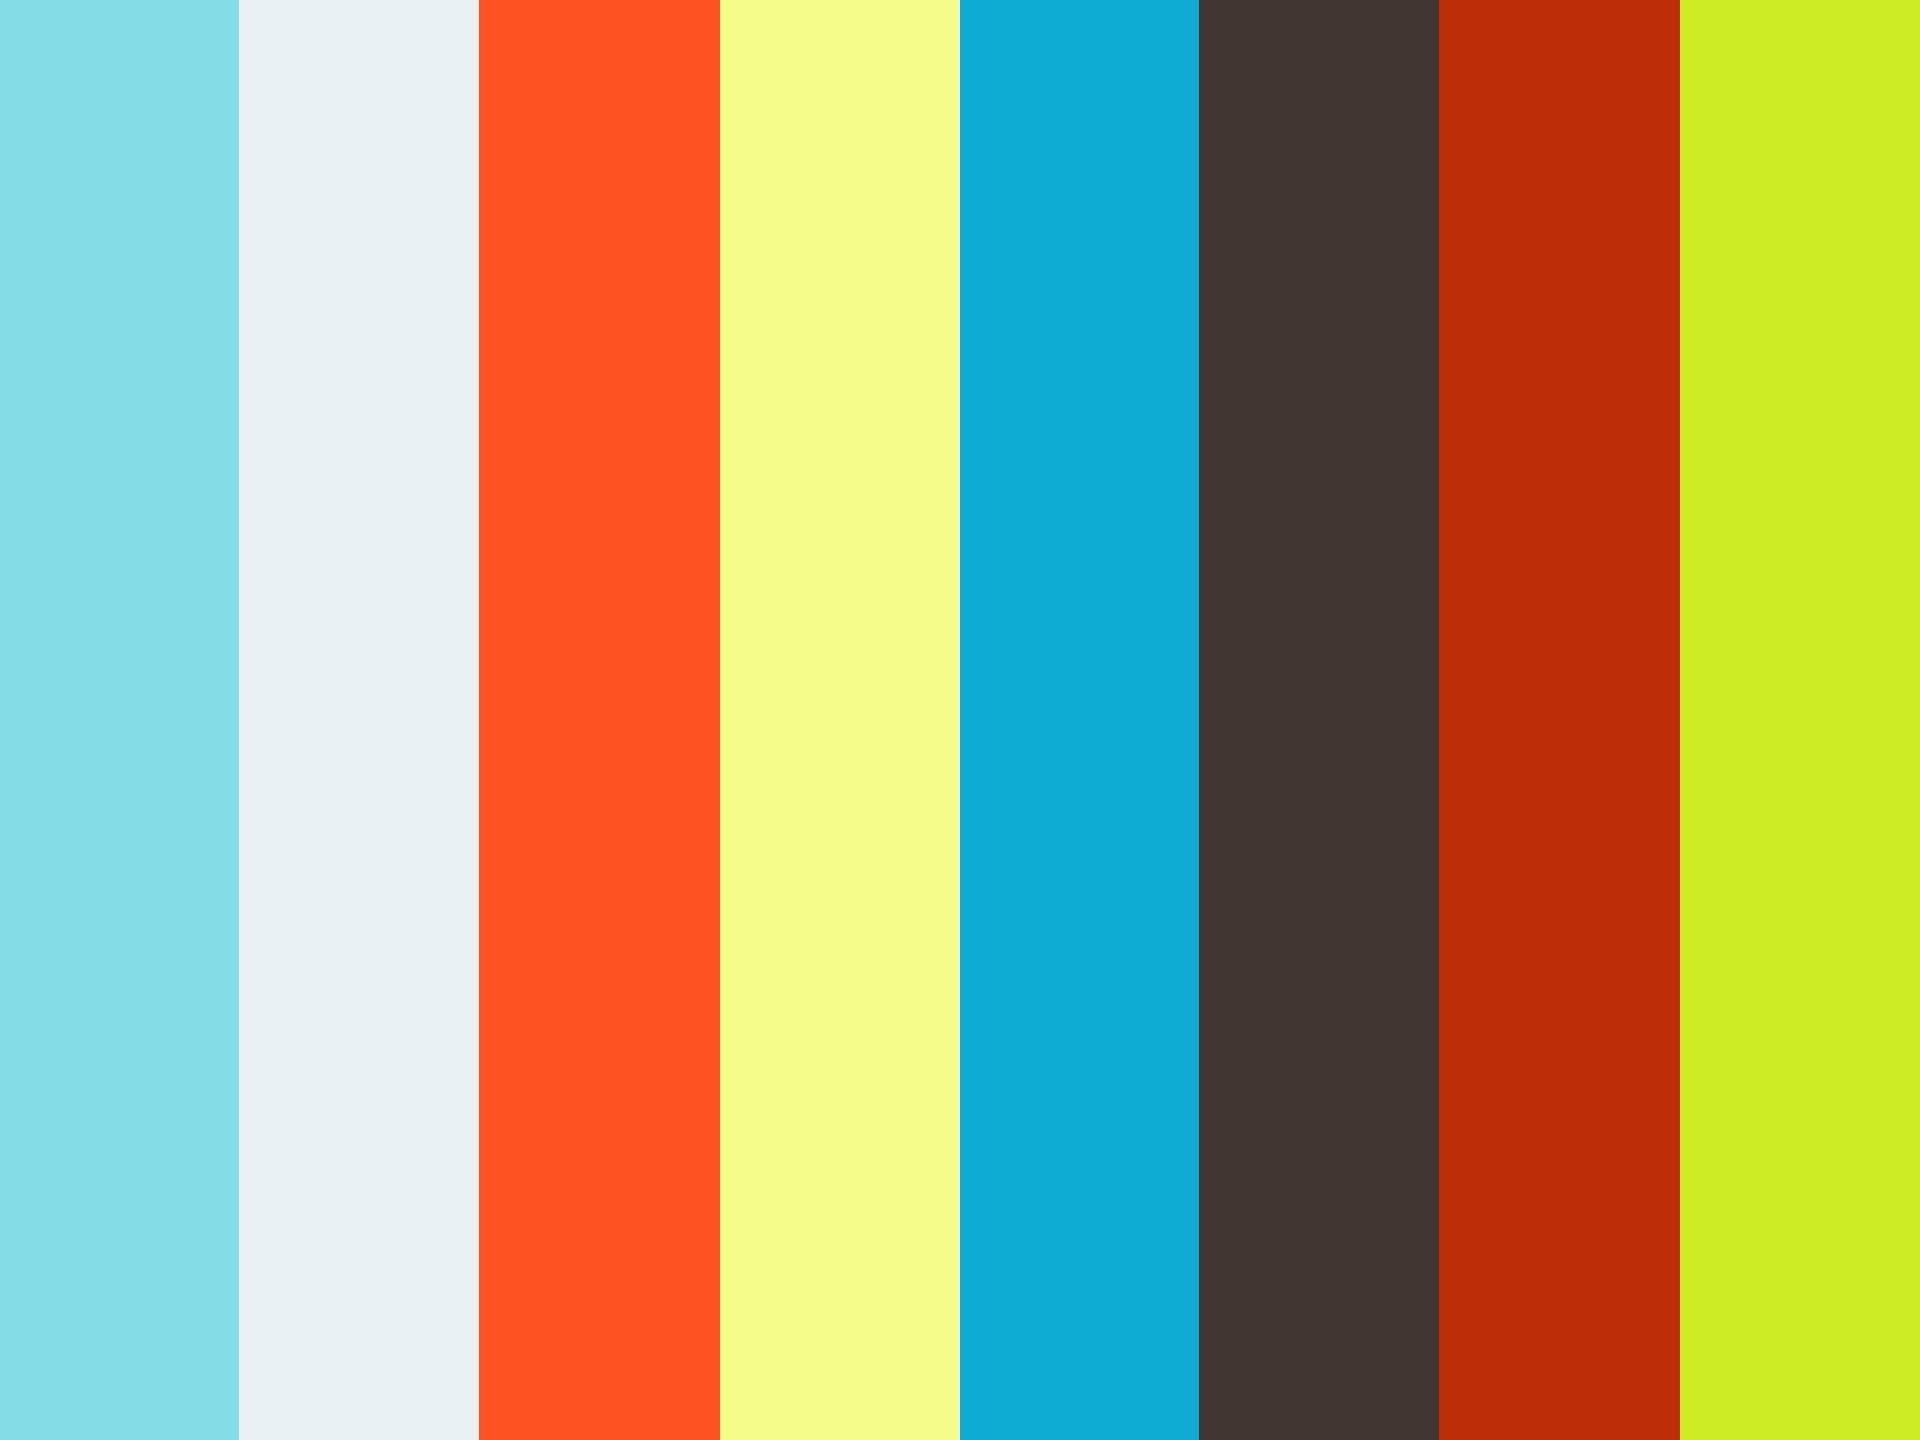 LEXUS LS460 SEWELL - BLACK - 2014